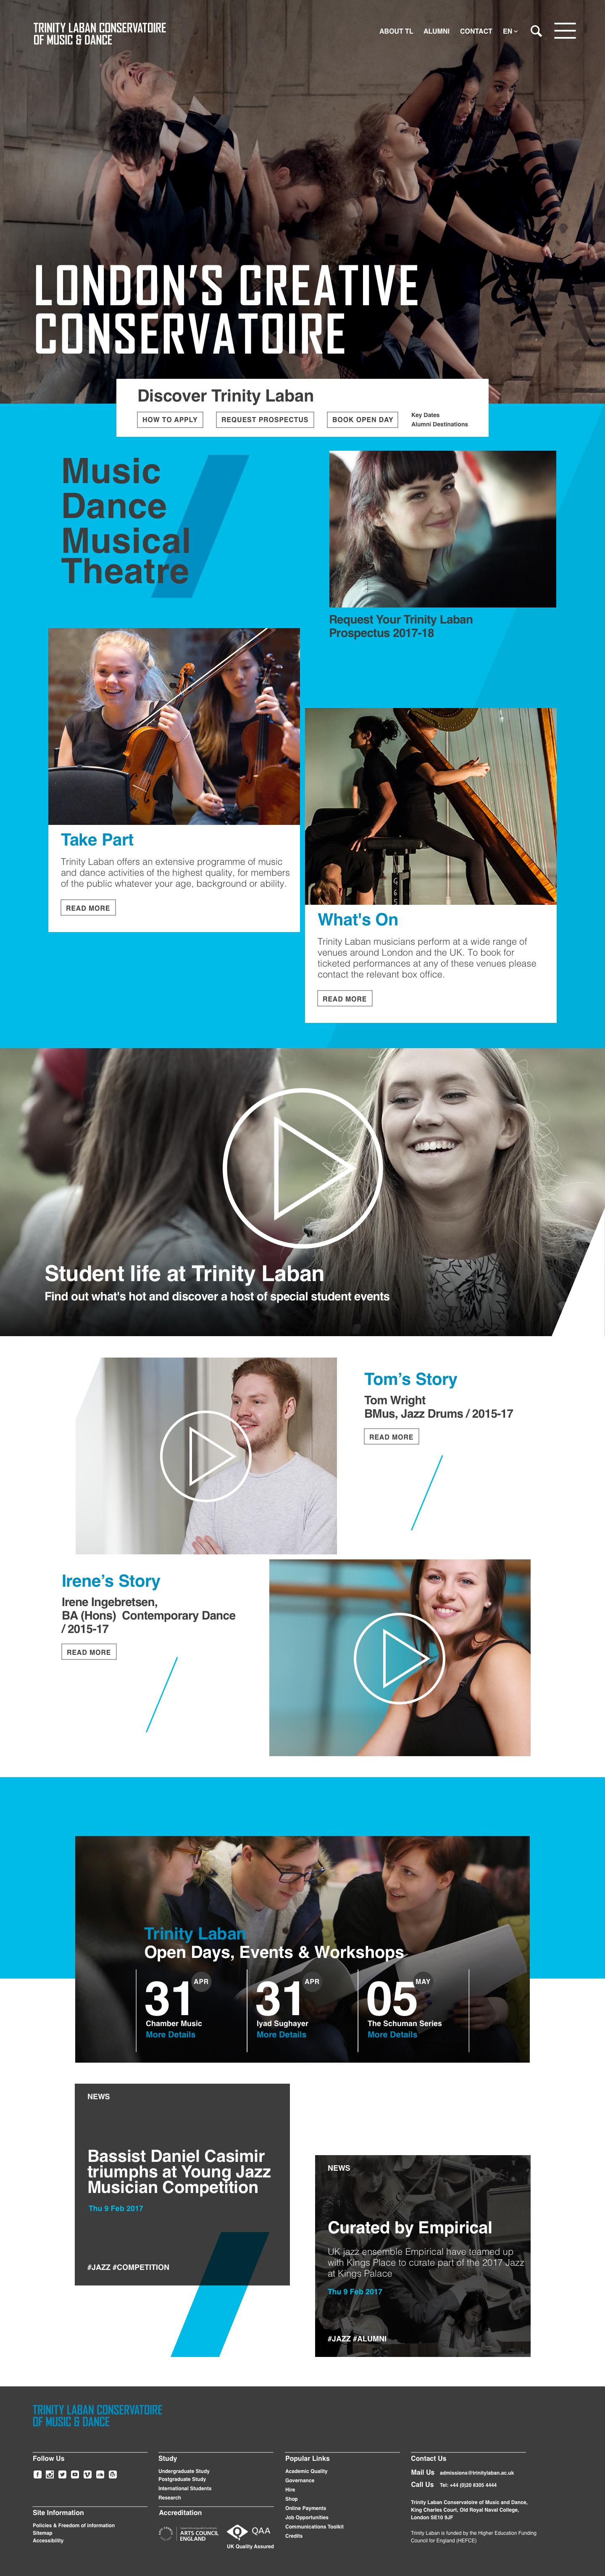 Trinitiy laban   homepage